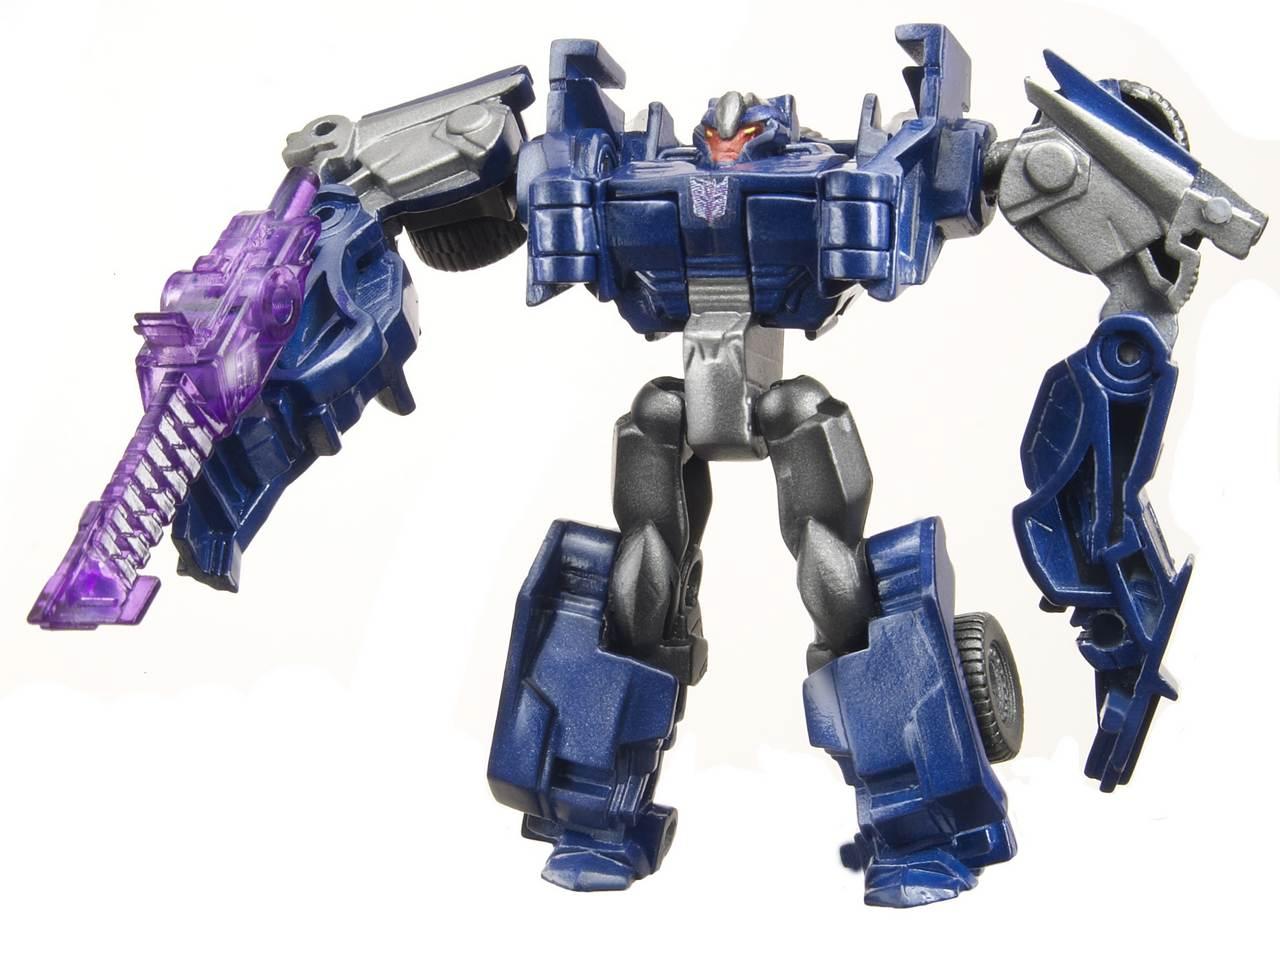 Transformers Prime BREAKDOWN complet Cyberverse